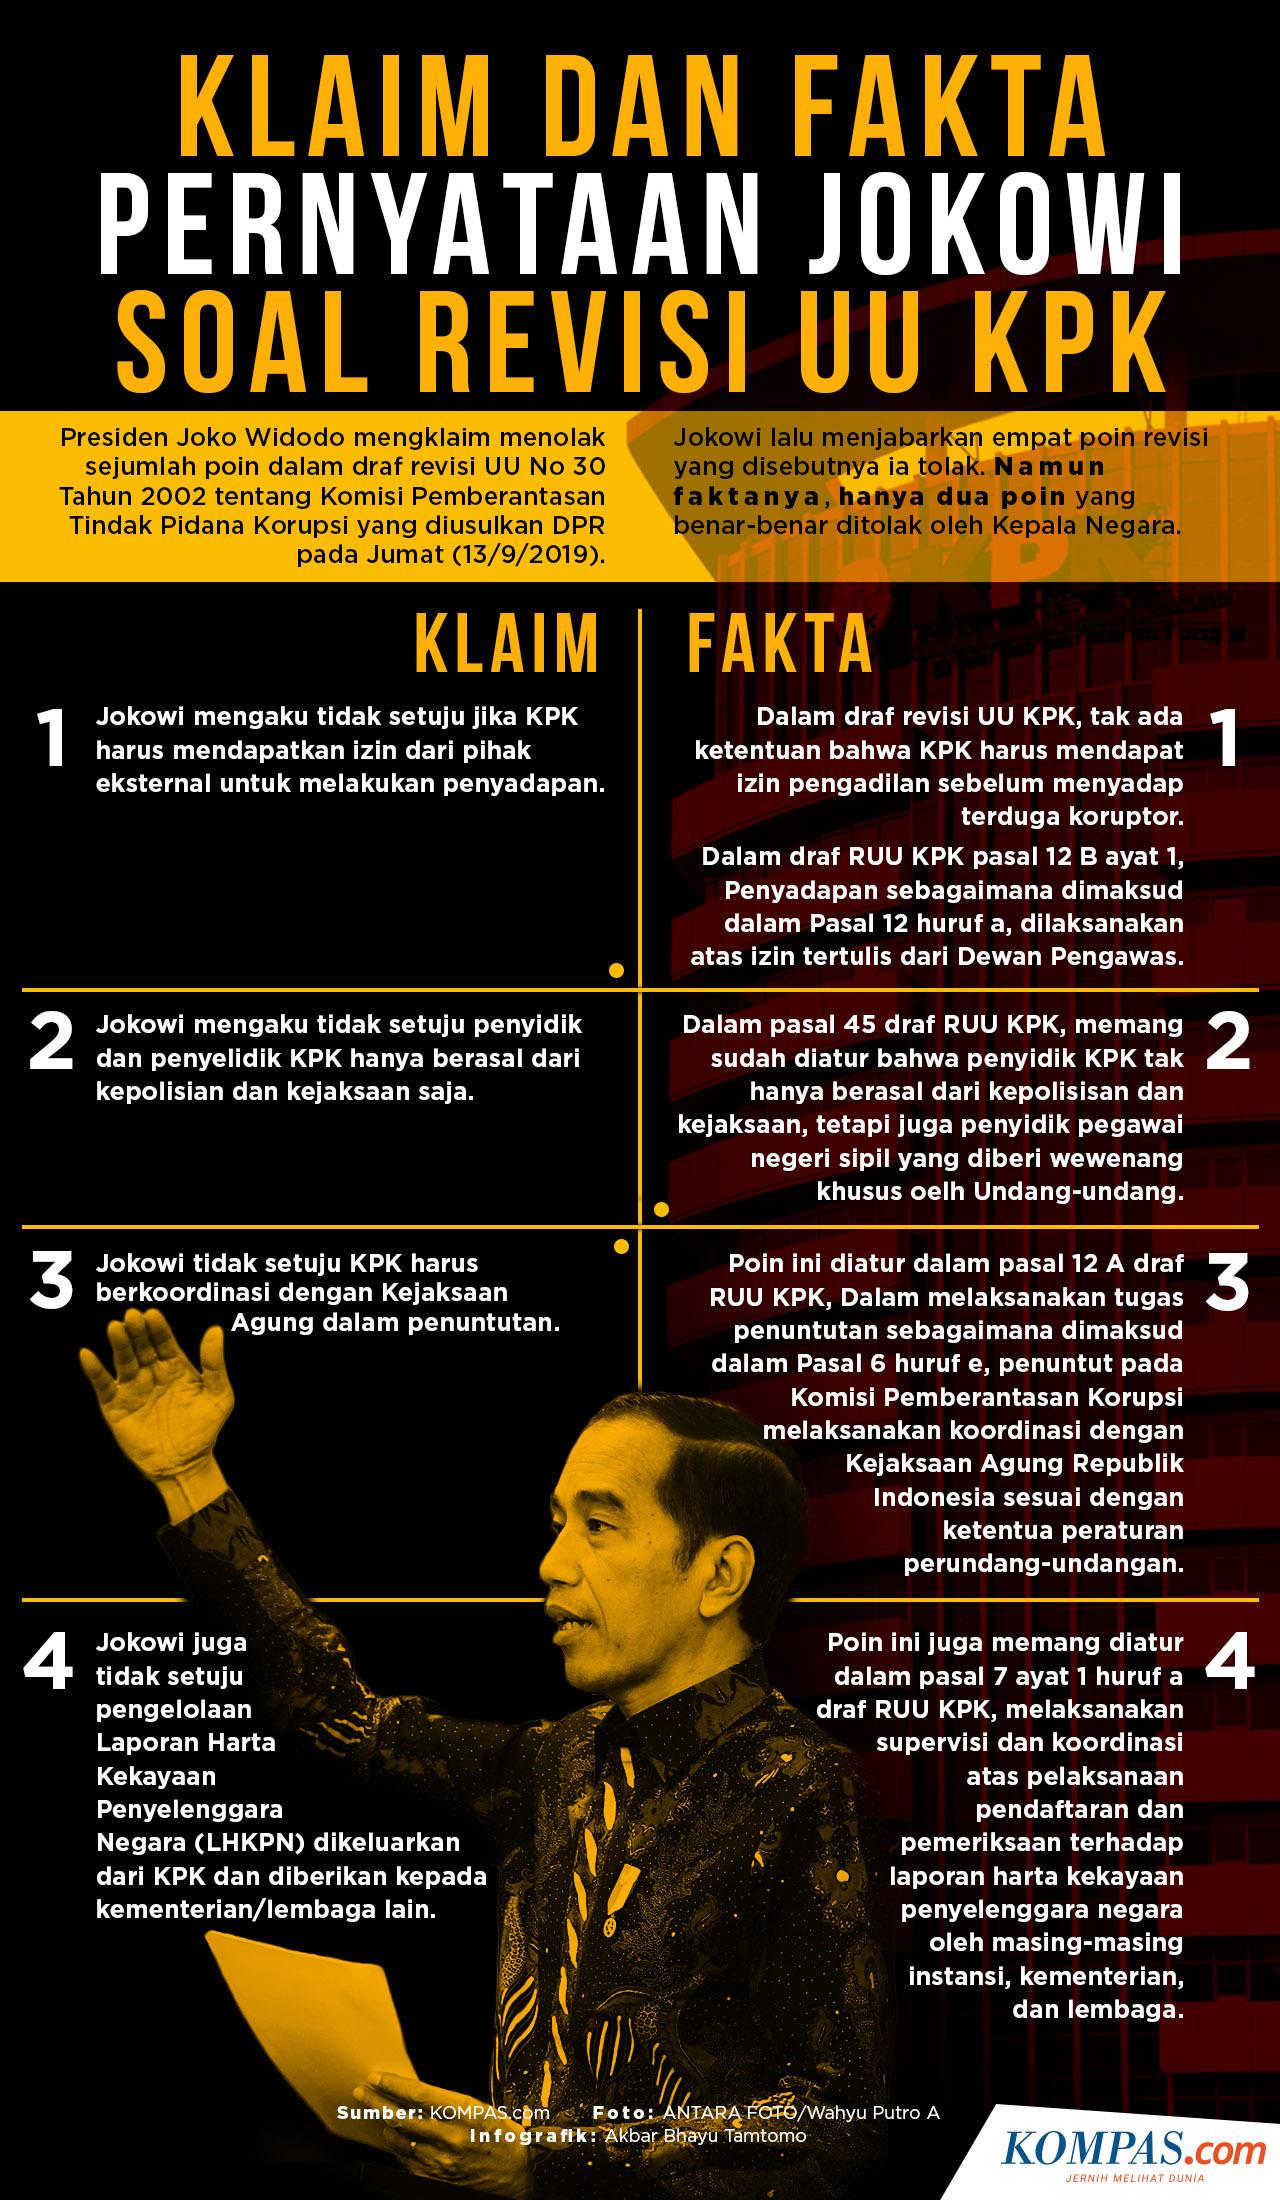 Jokowi Infografik: Klaim dan Fakta Pernyataan Jokowi Soal Revisi UU KPK